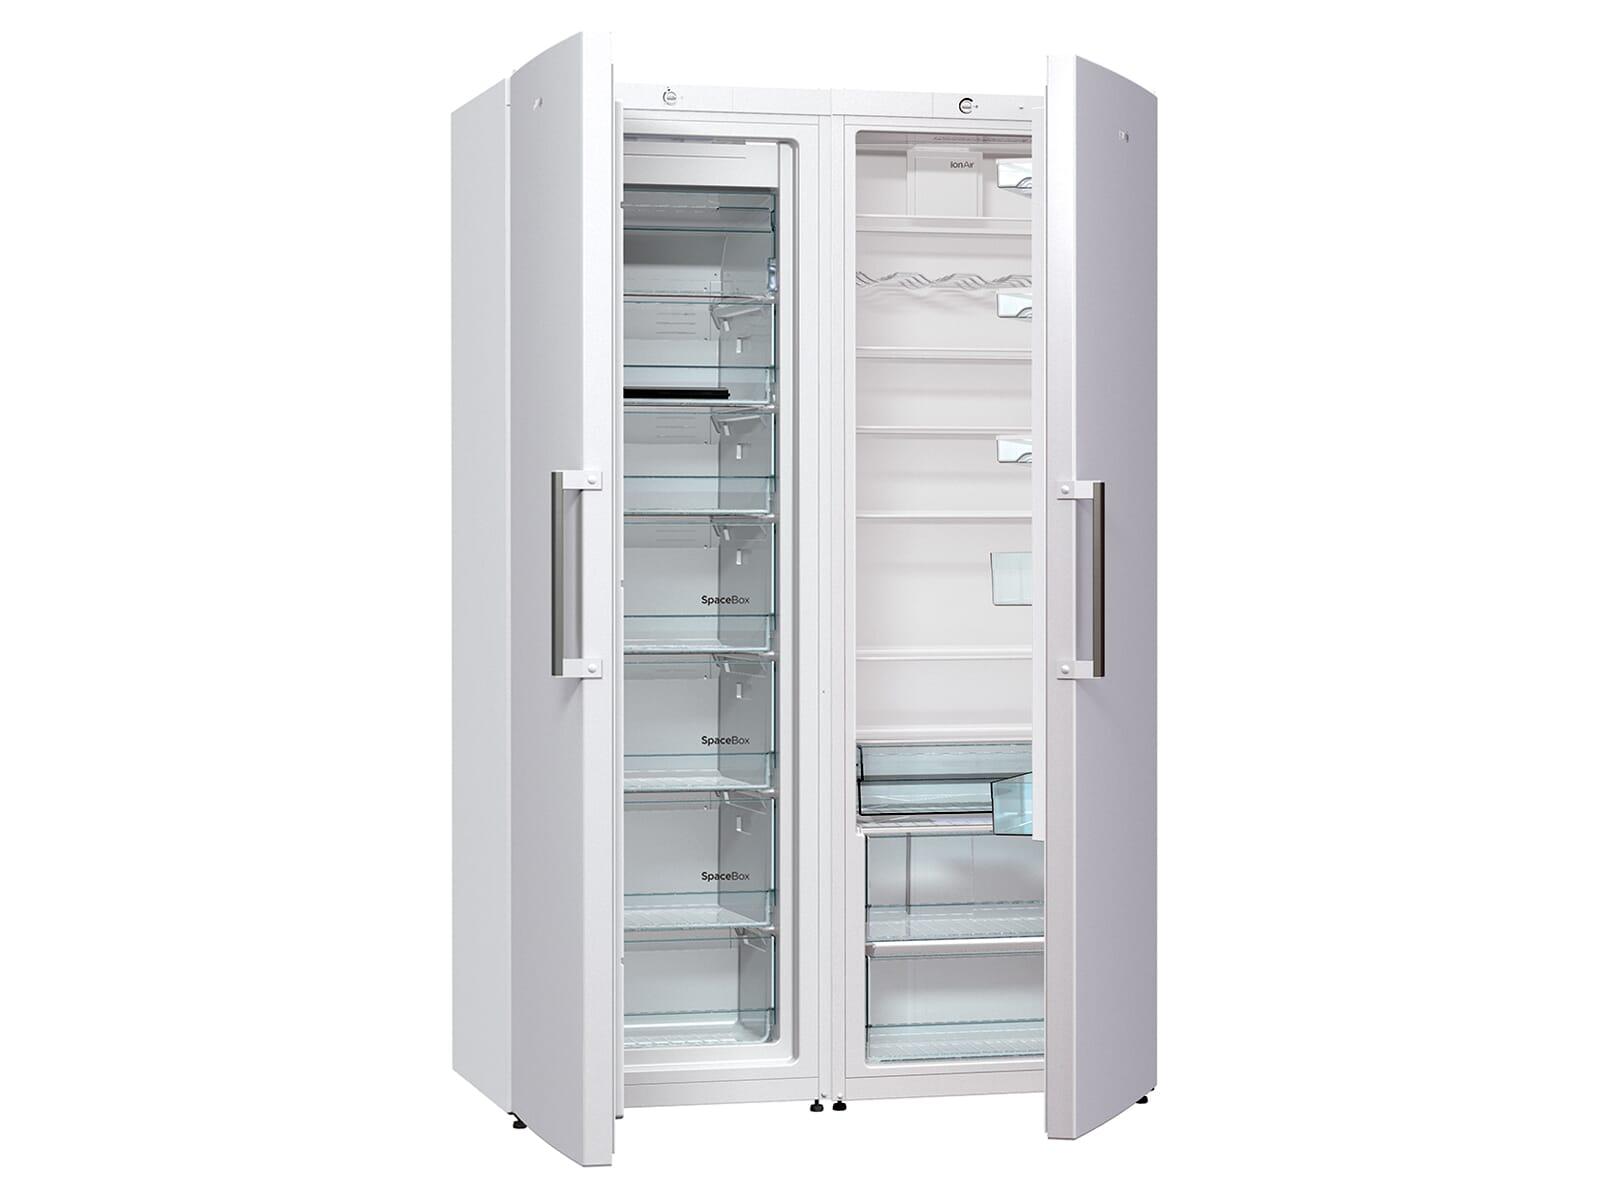 Gorenje Kühlschrank Bedienungsanleitung : Gorenje sbs cfw side by side kühl gefrier kombination weiß